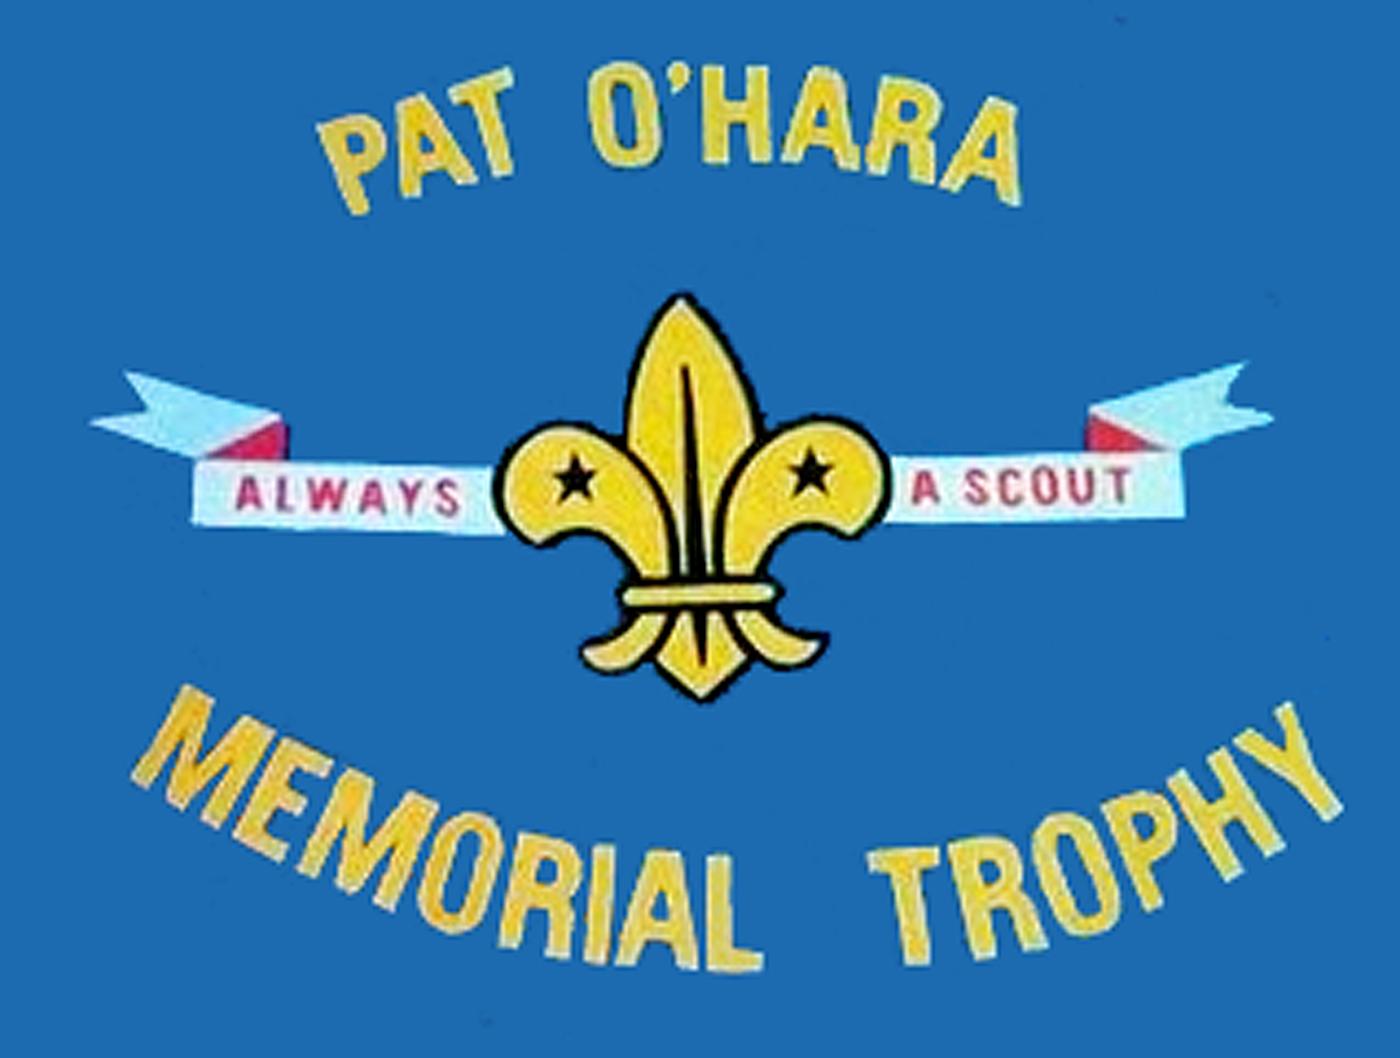 Icknield Pat O'Hara Trophy 2018